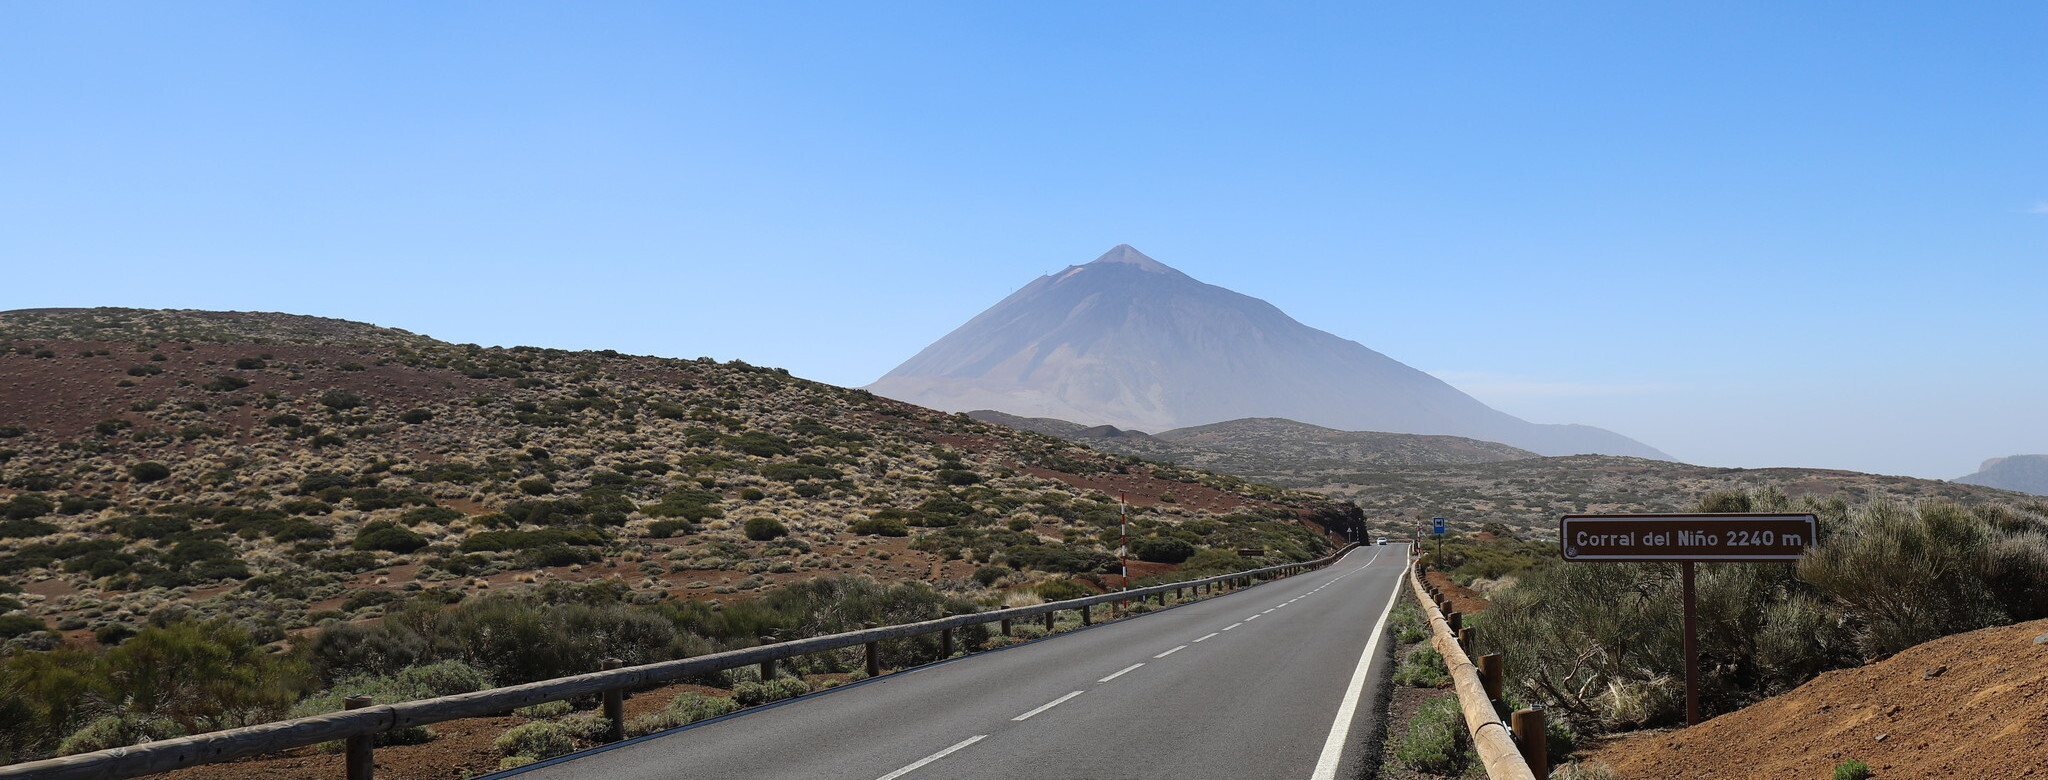 Unser Bergtraining am Teide